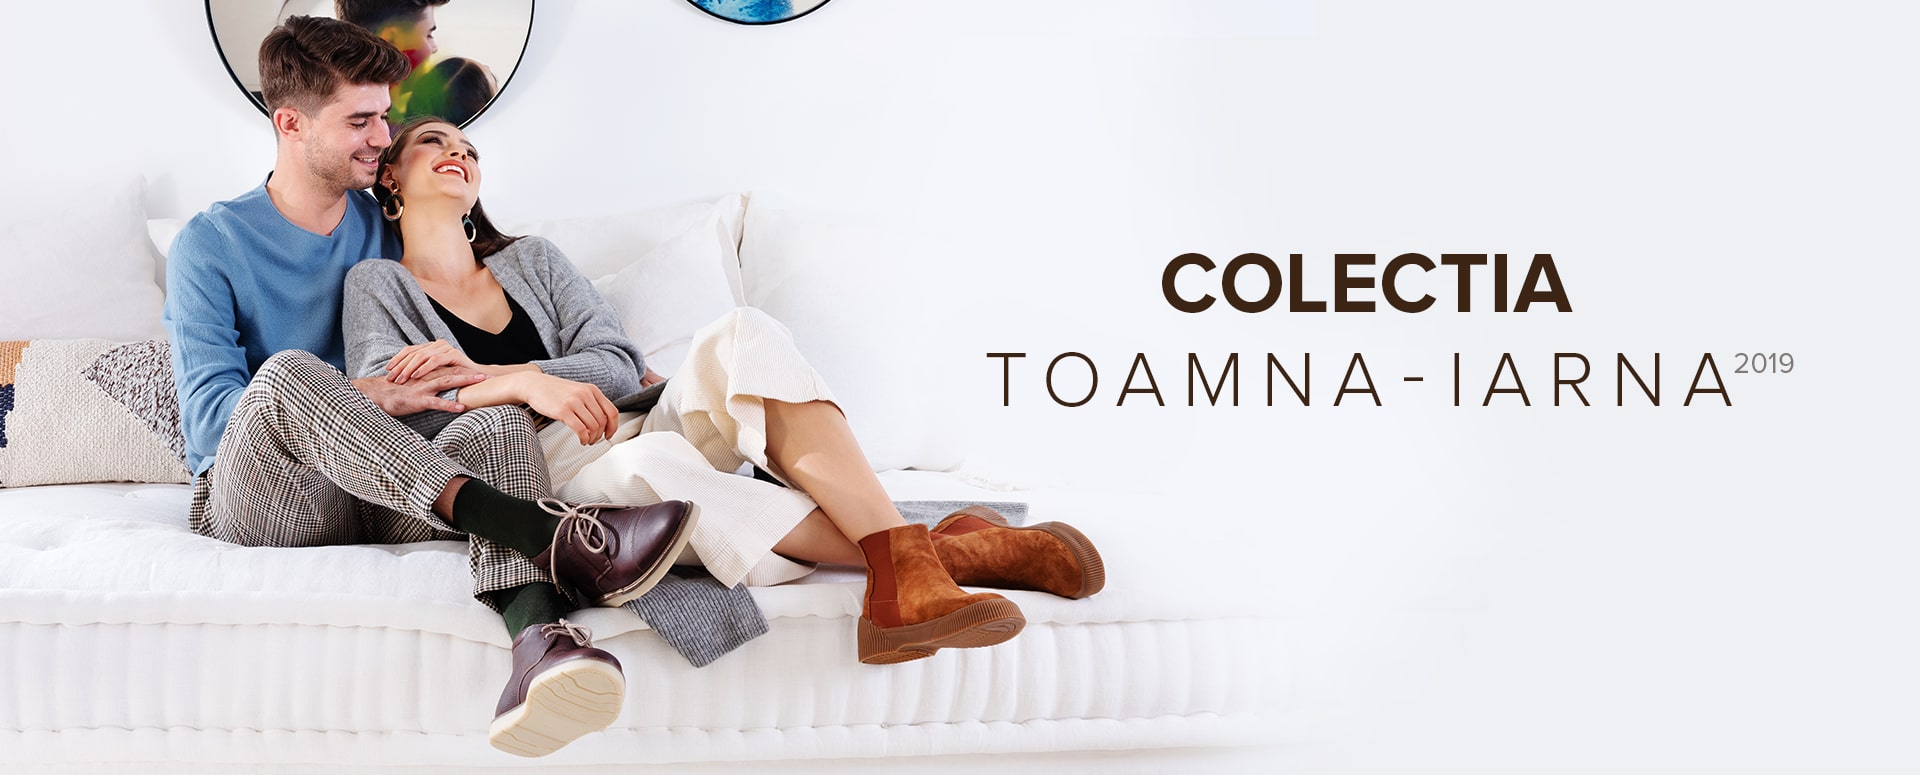 Produse confortabile, de calitate. Pantofi, mocasini, ghete, cizme, sandale, papuci. Articole si livrare fara repros,